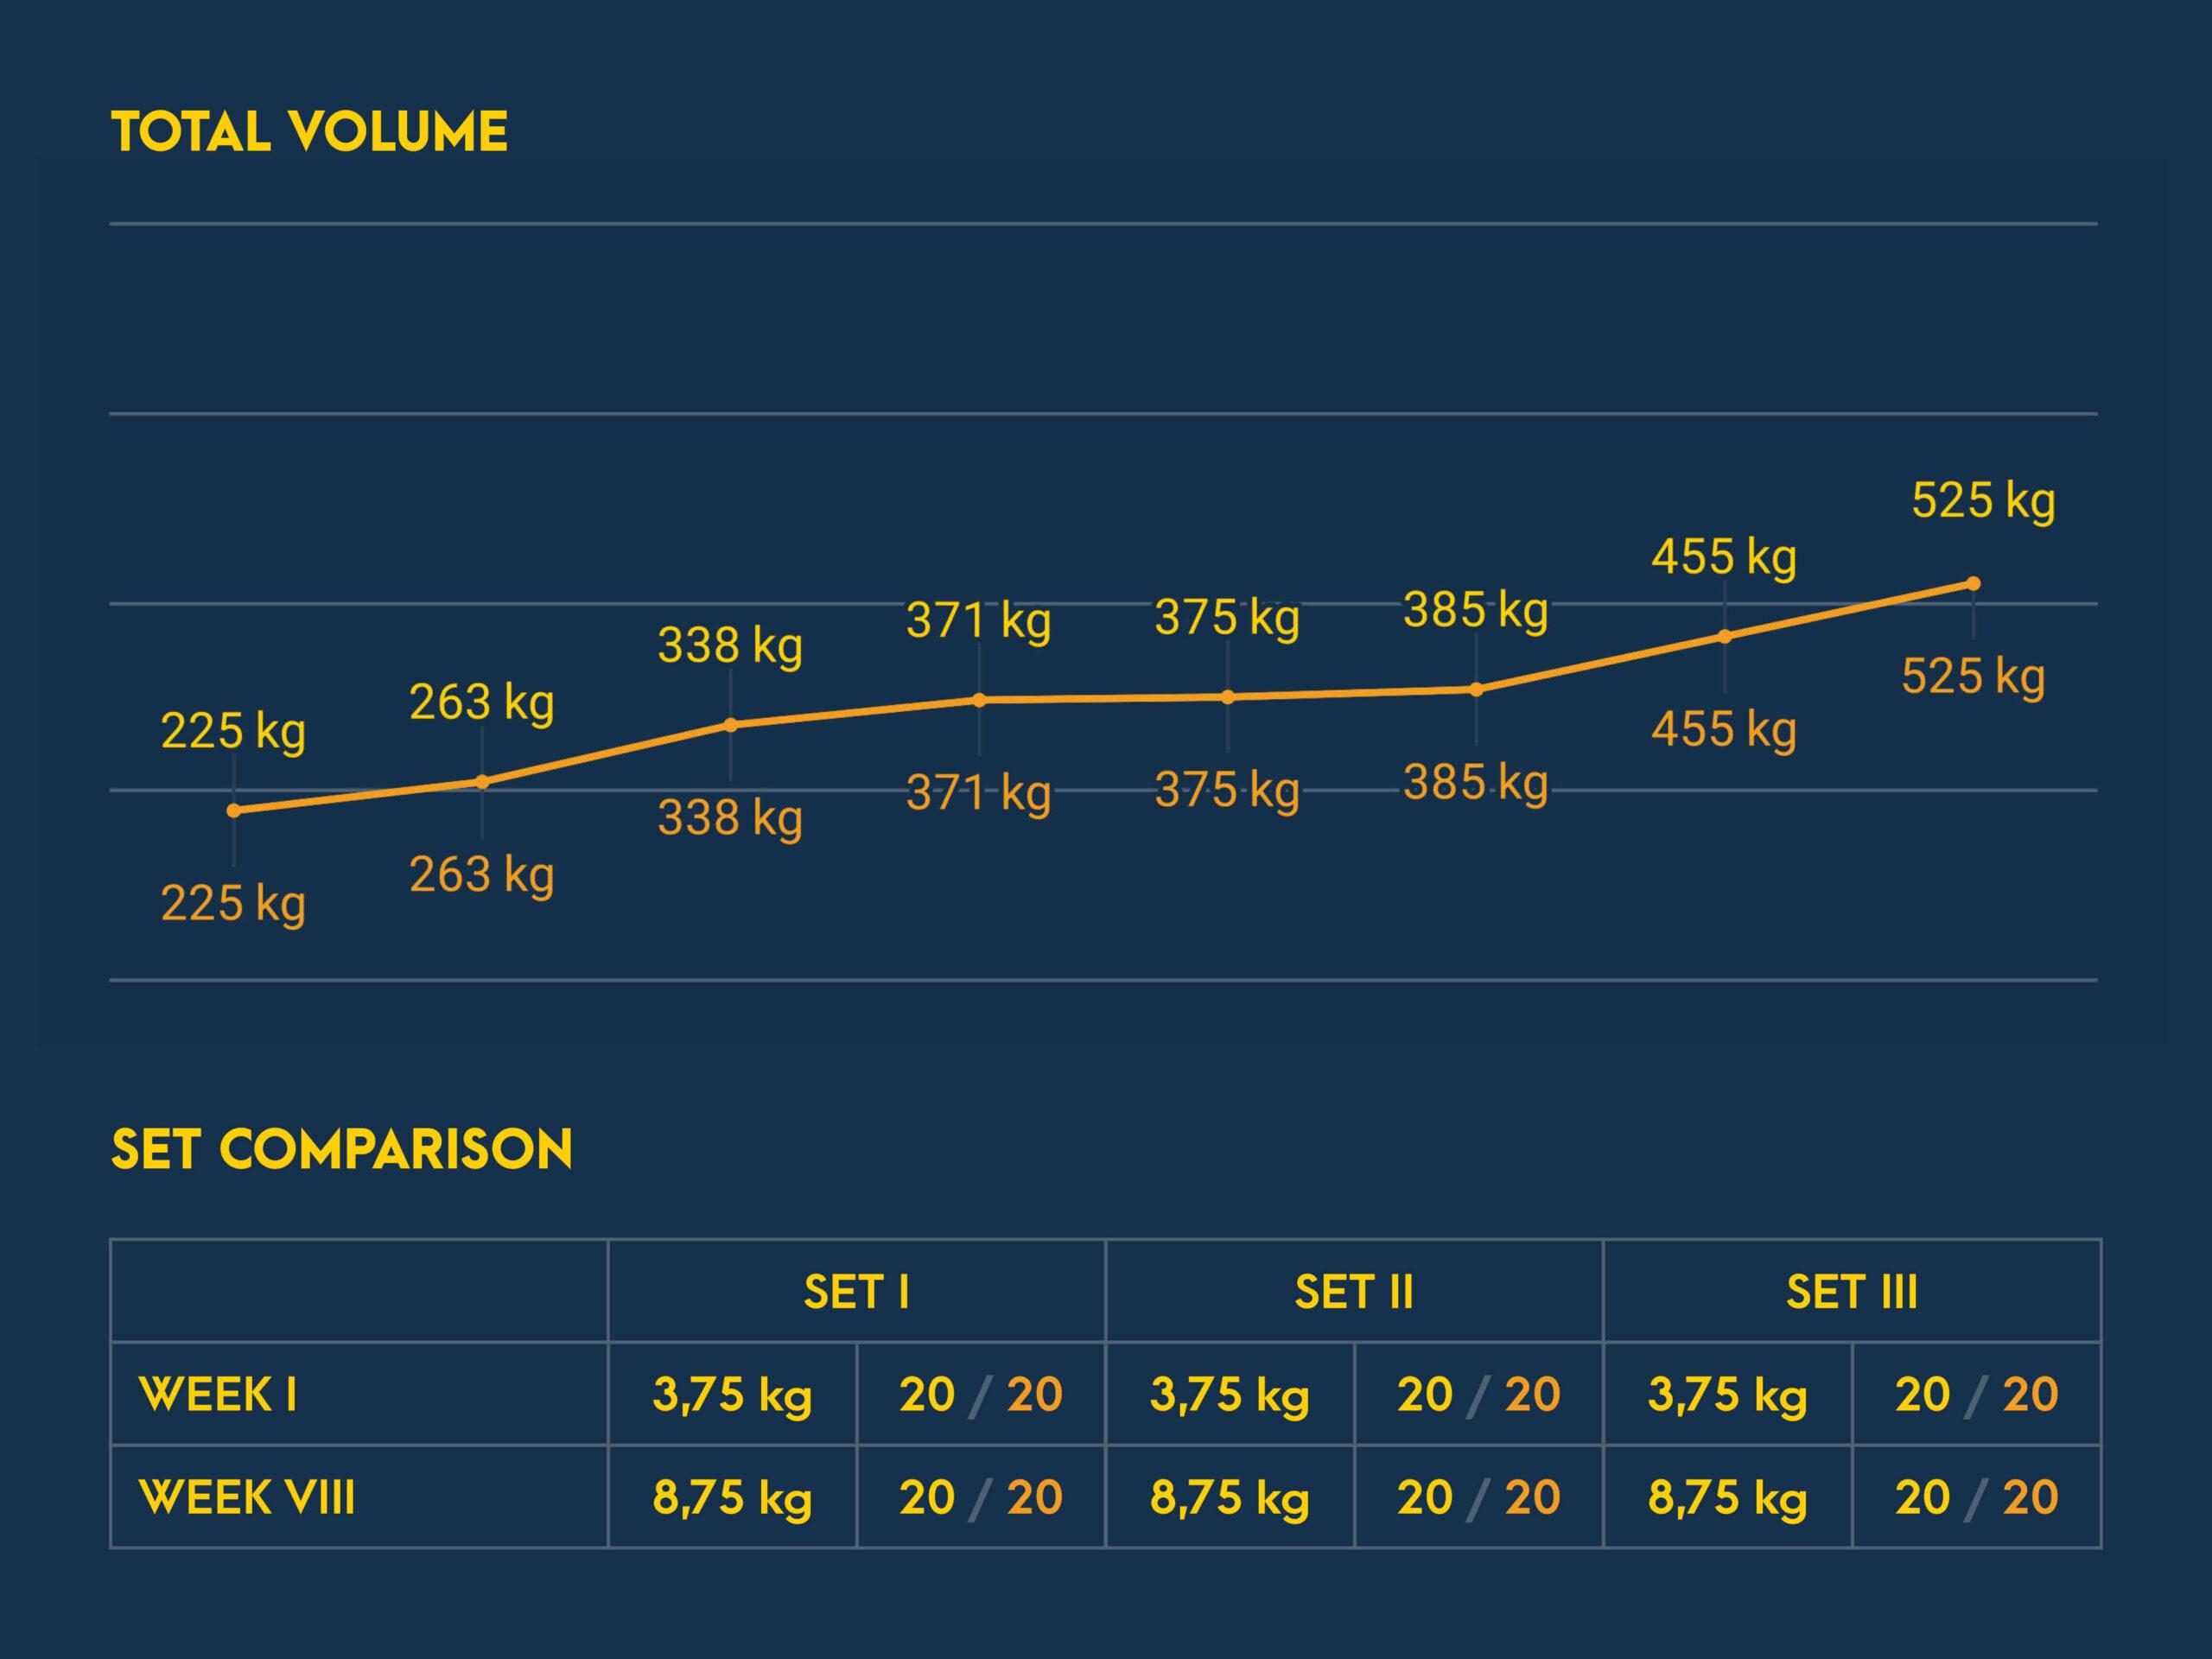 Cable External Rotation Progress